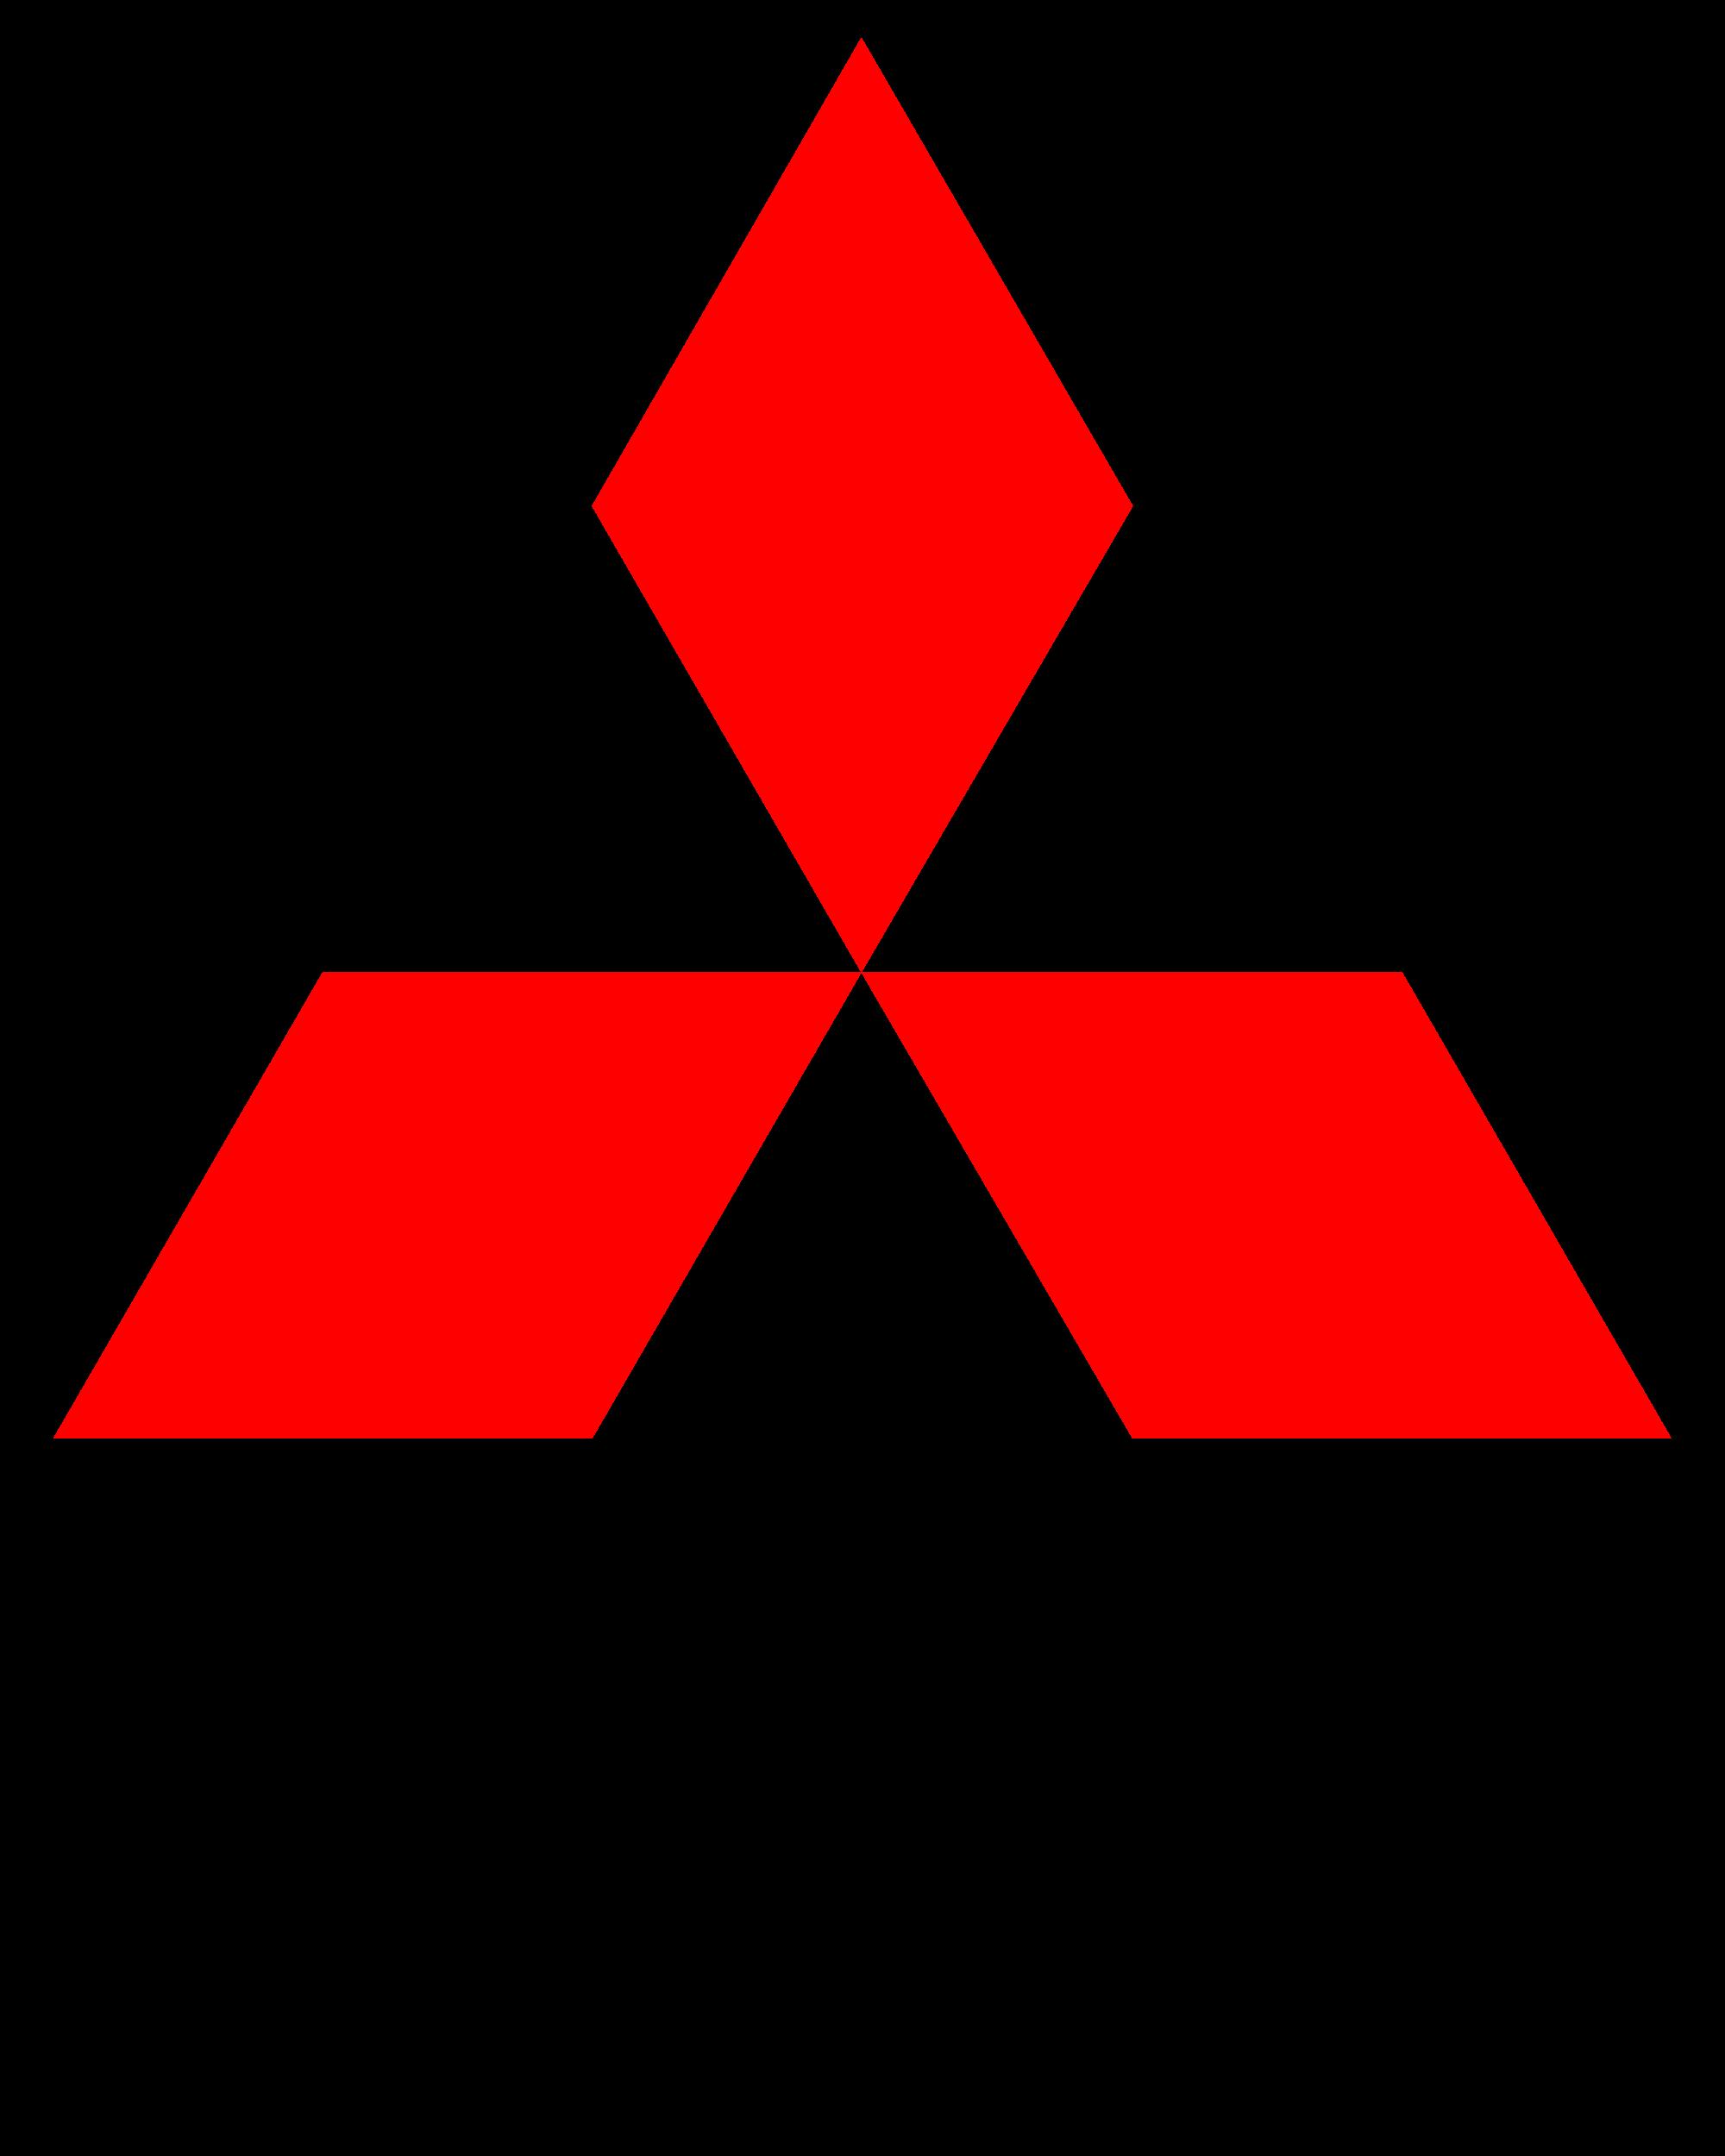 Car Logo Mitsubishi - Car, Transparent background PNG HD thumbnail